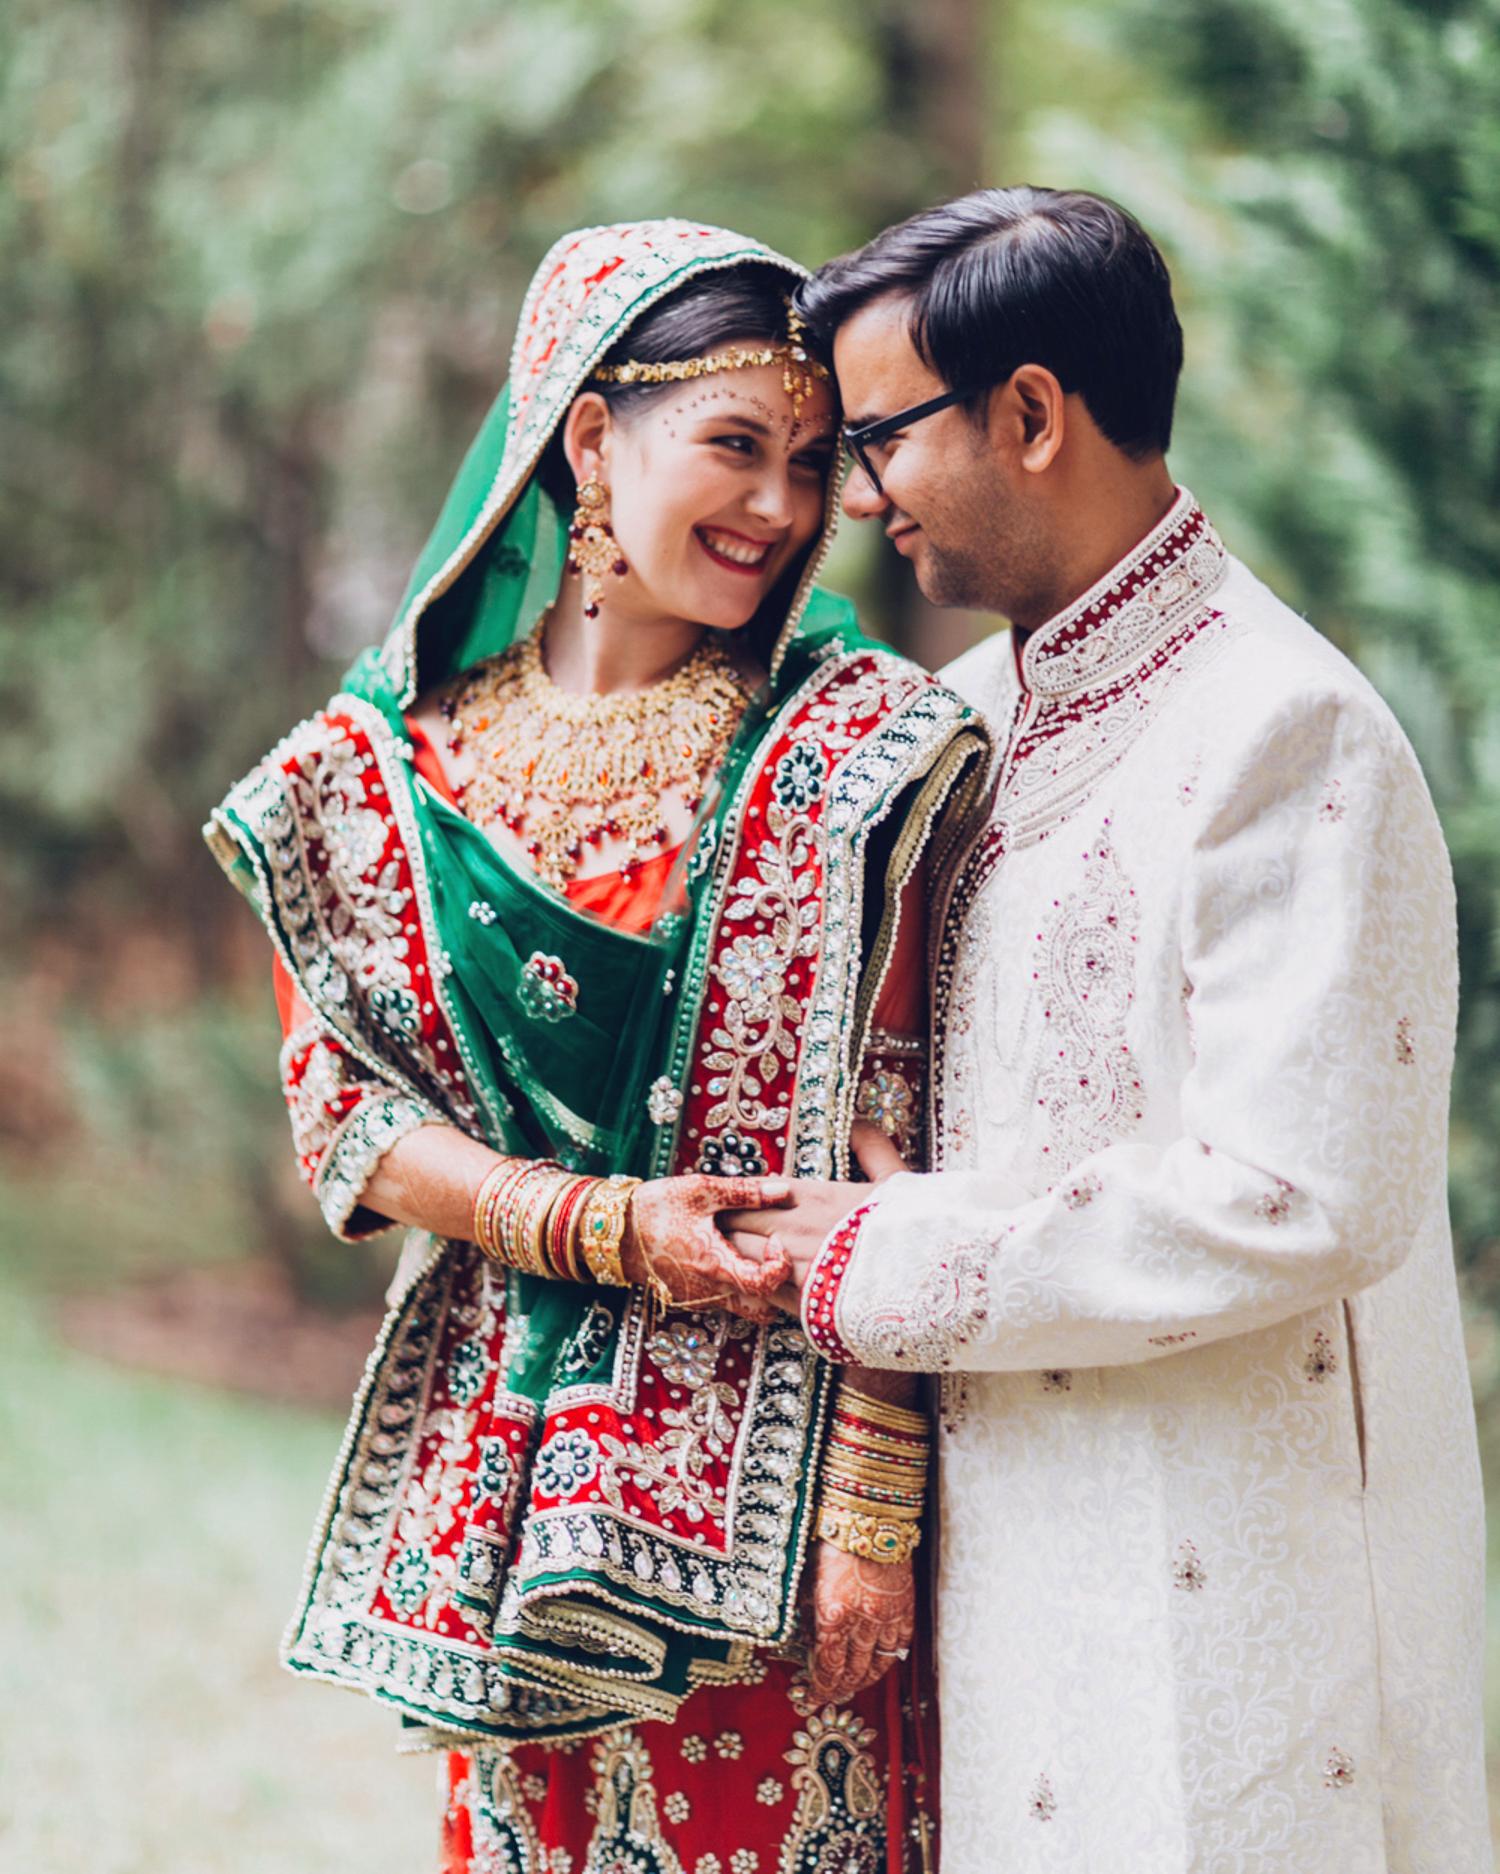 thea-rachit-wedding-couple-1856t-s112016-0715.jpg